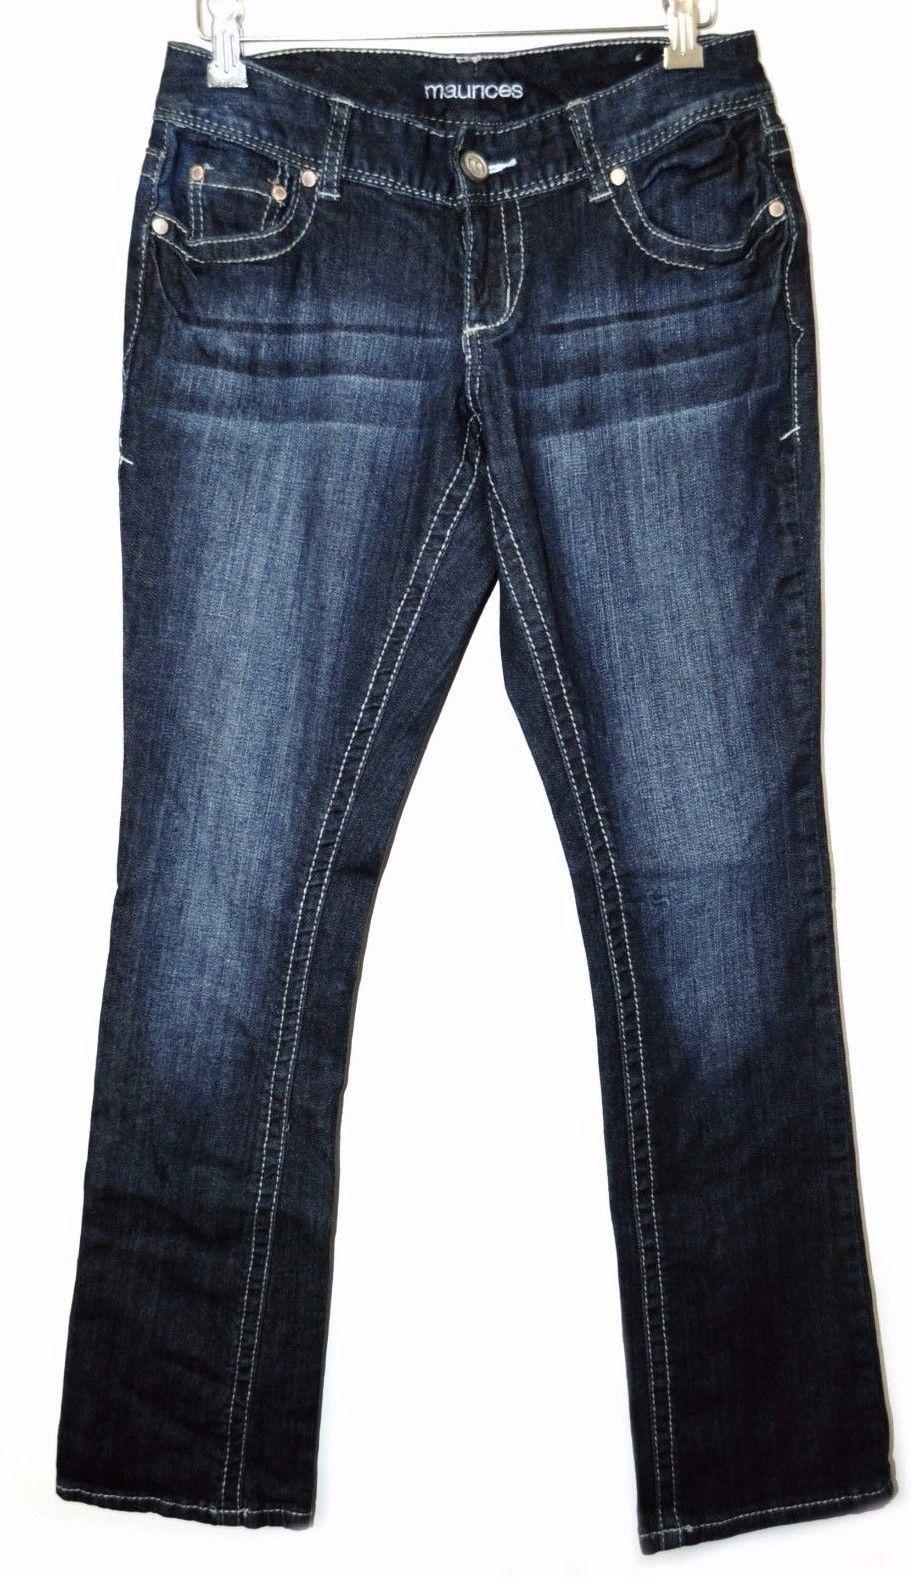 12c7fb2fc39 NEW MAURICES Original Fit Straight Denim Pants Plain Jeans Woman  1 2  Regular -  11.99